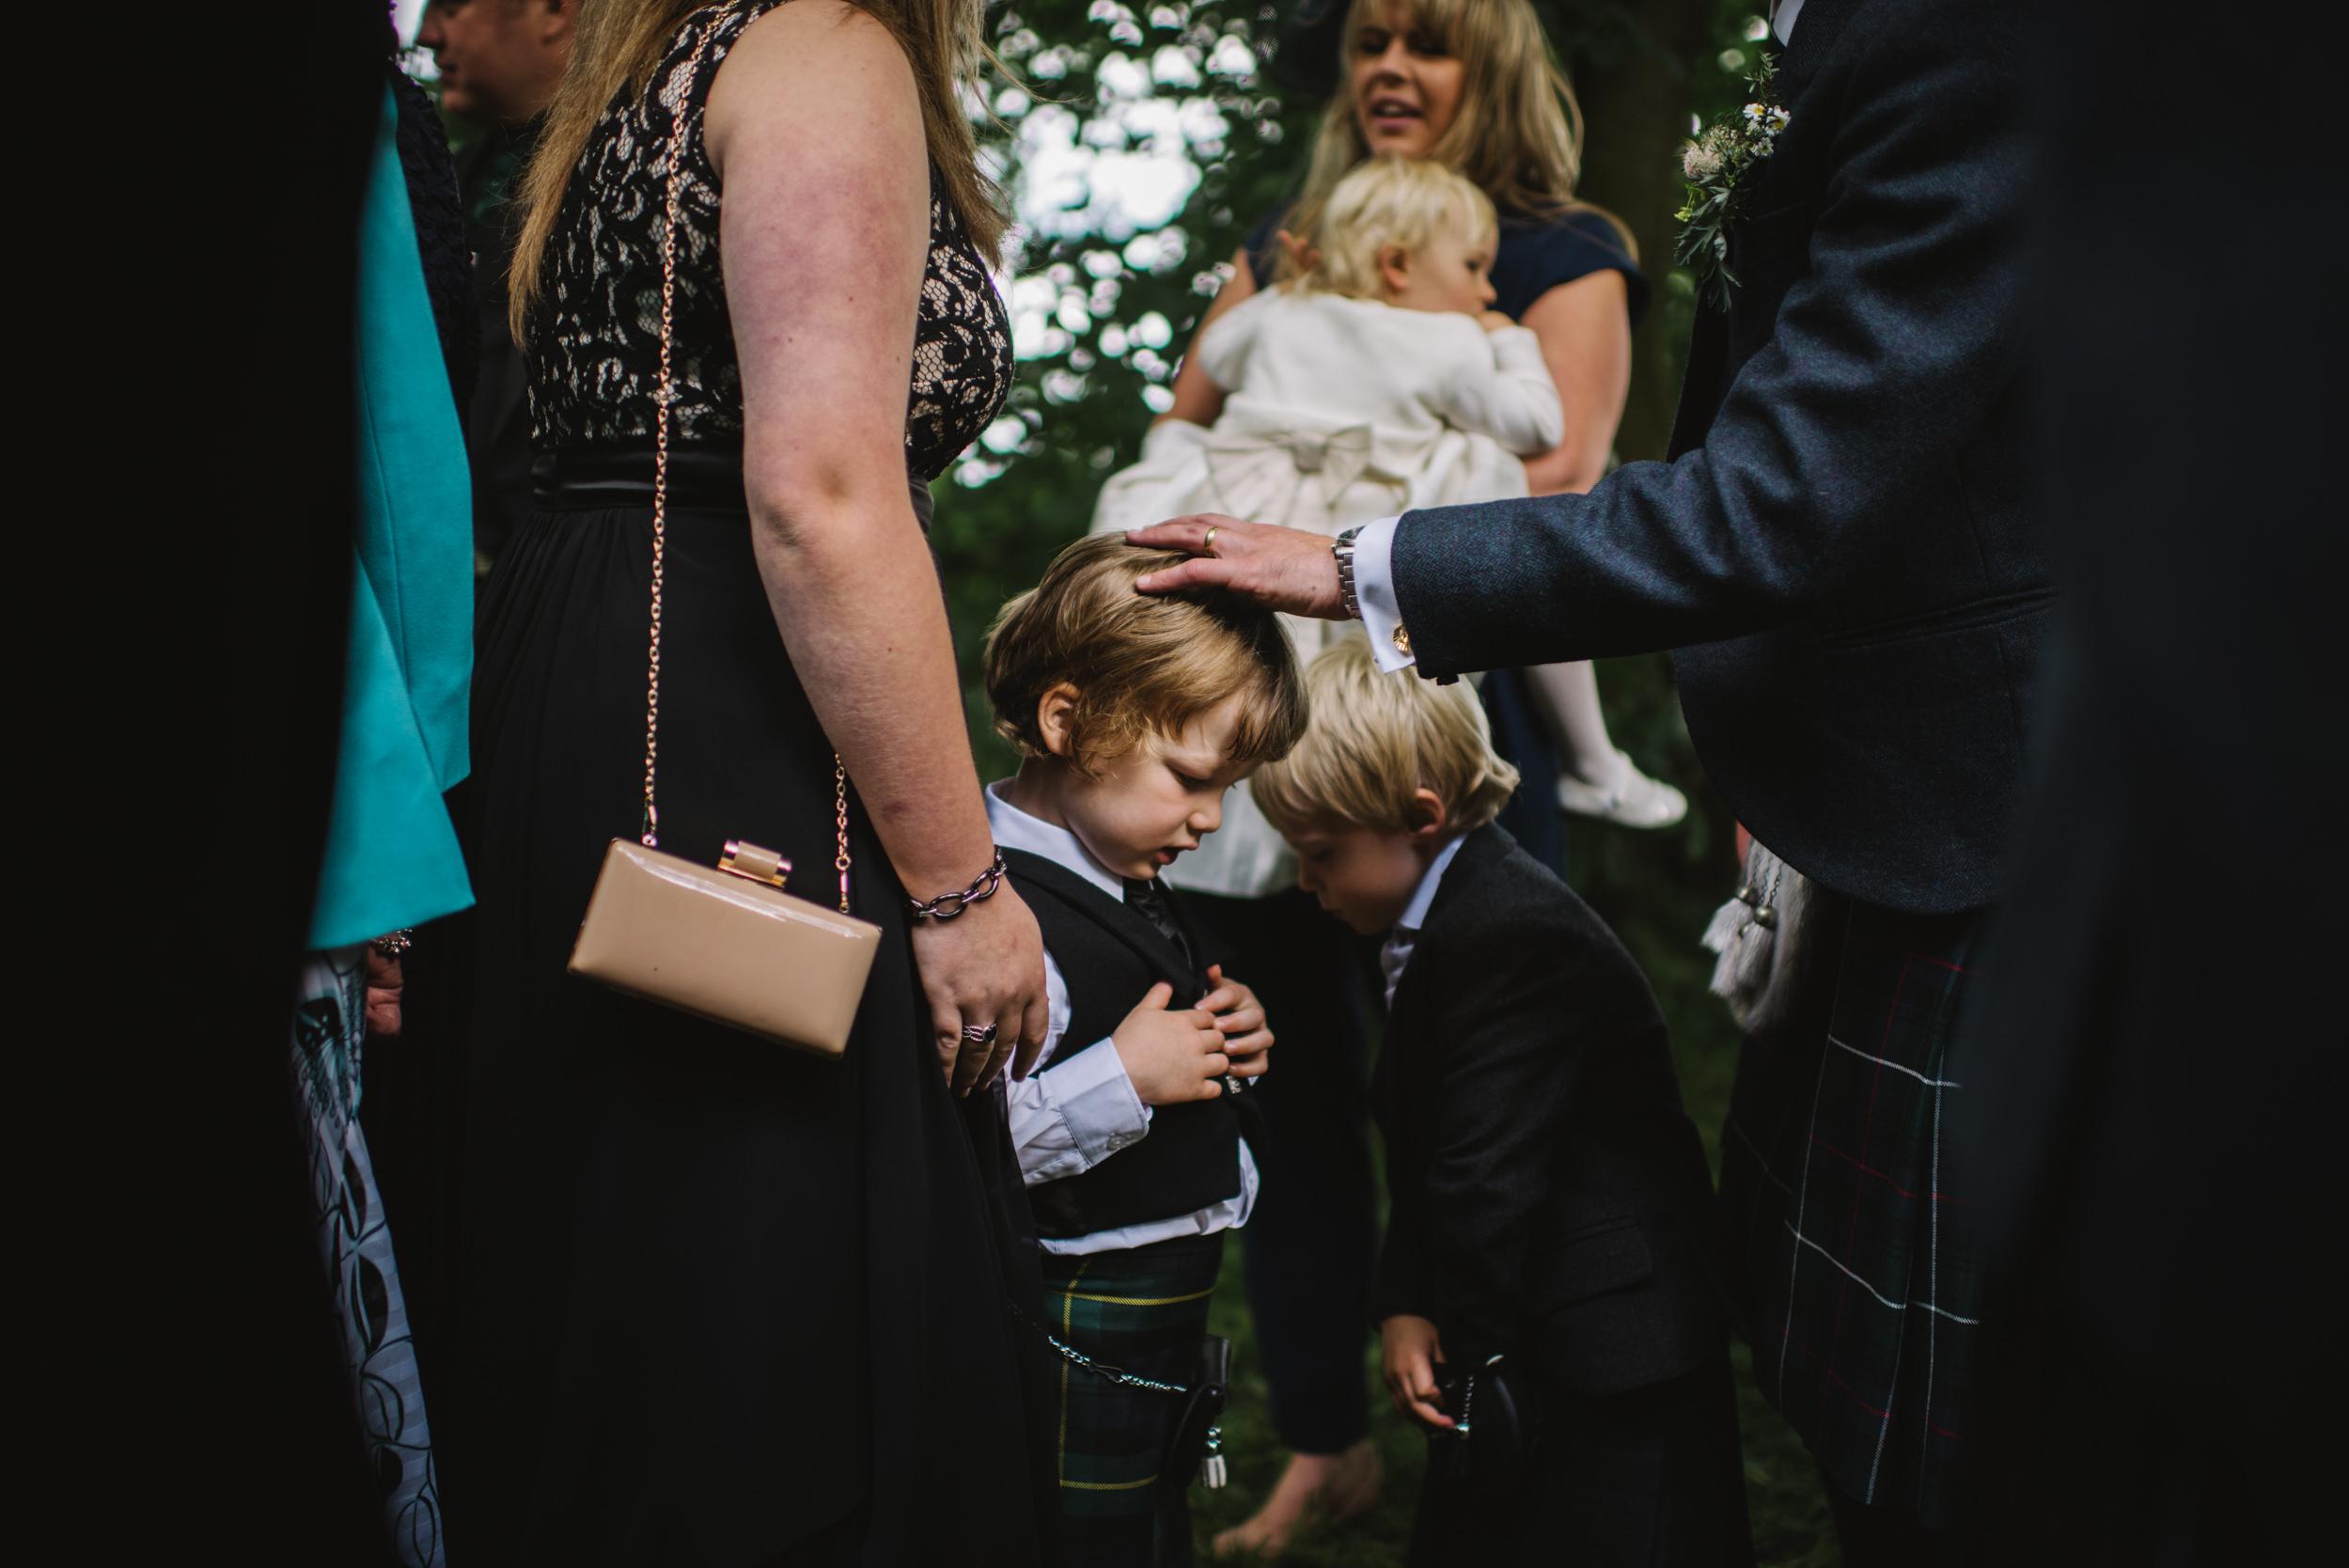 0061-alternative-wedding-portrait-family-kids-photographer-glasgow-scotland.JPG